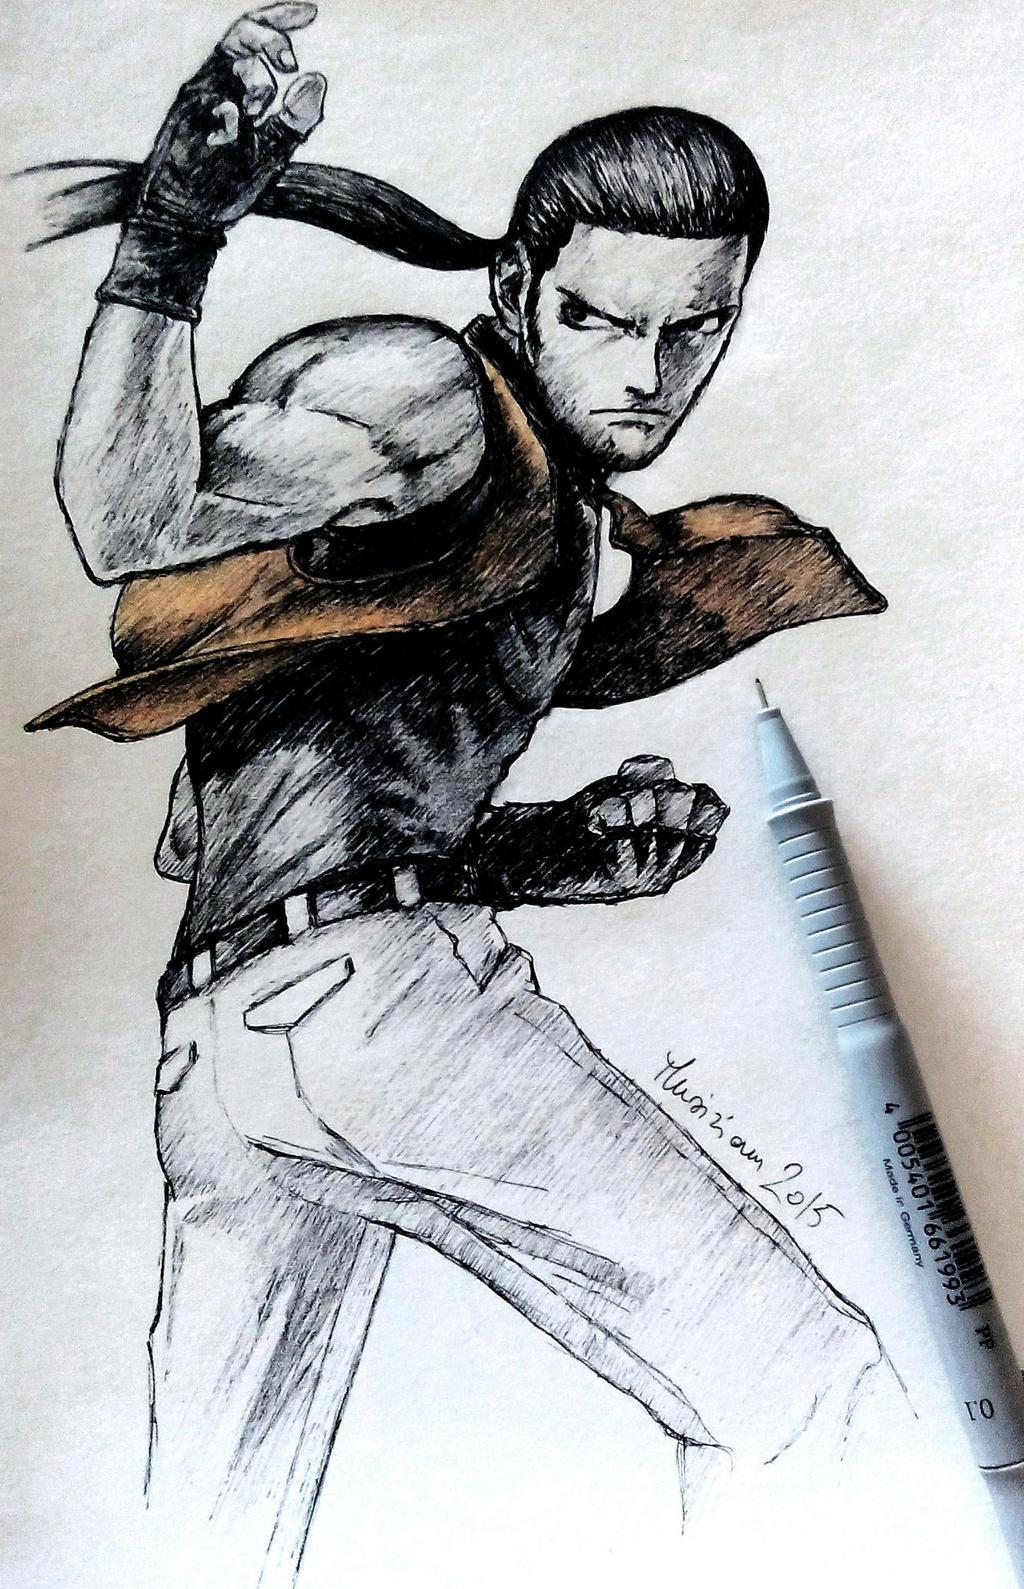 Robert Garcia Art Of Fighting Ink By Musiriam On Deviantart